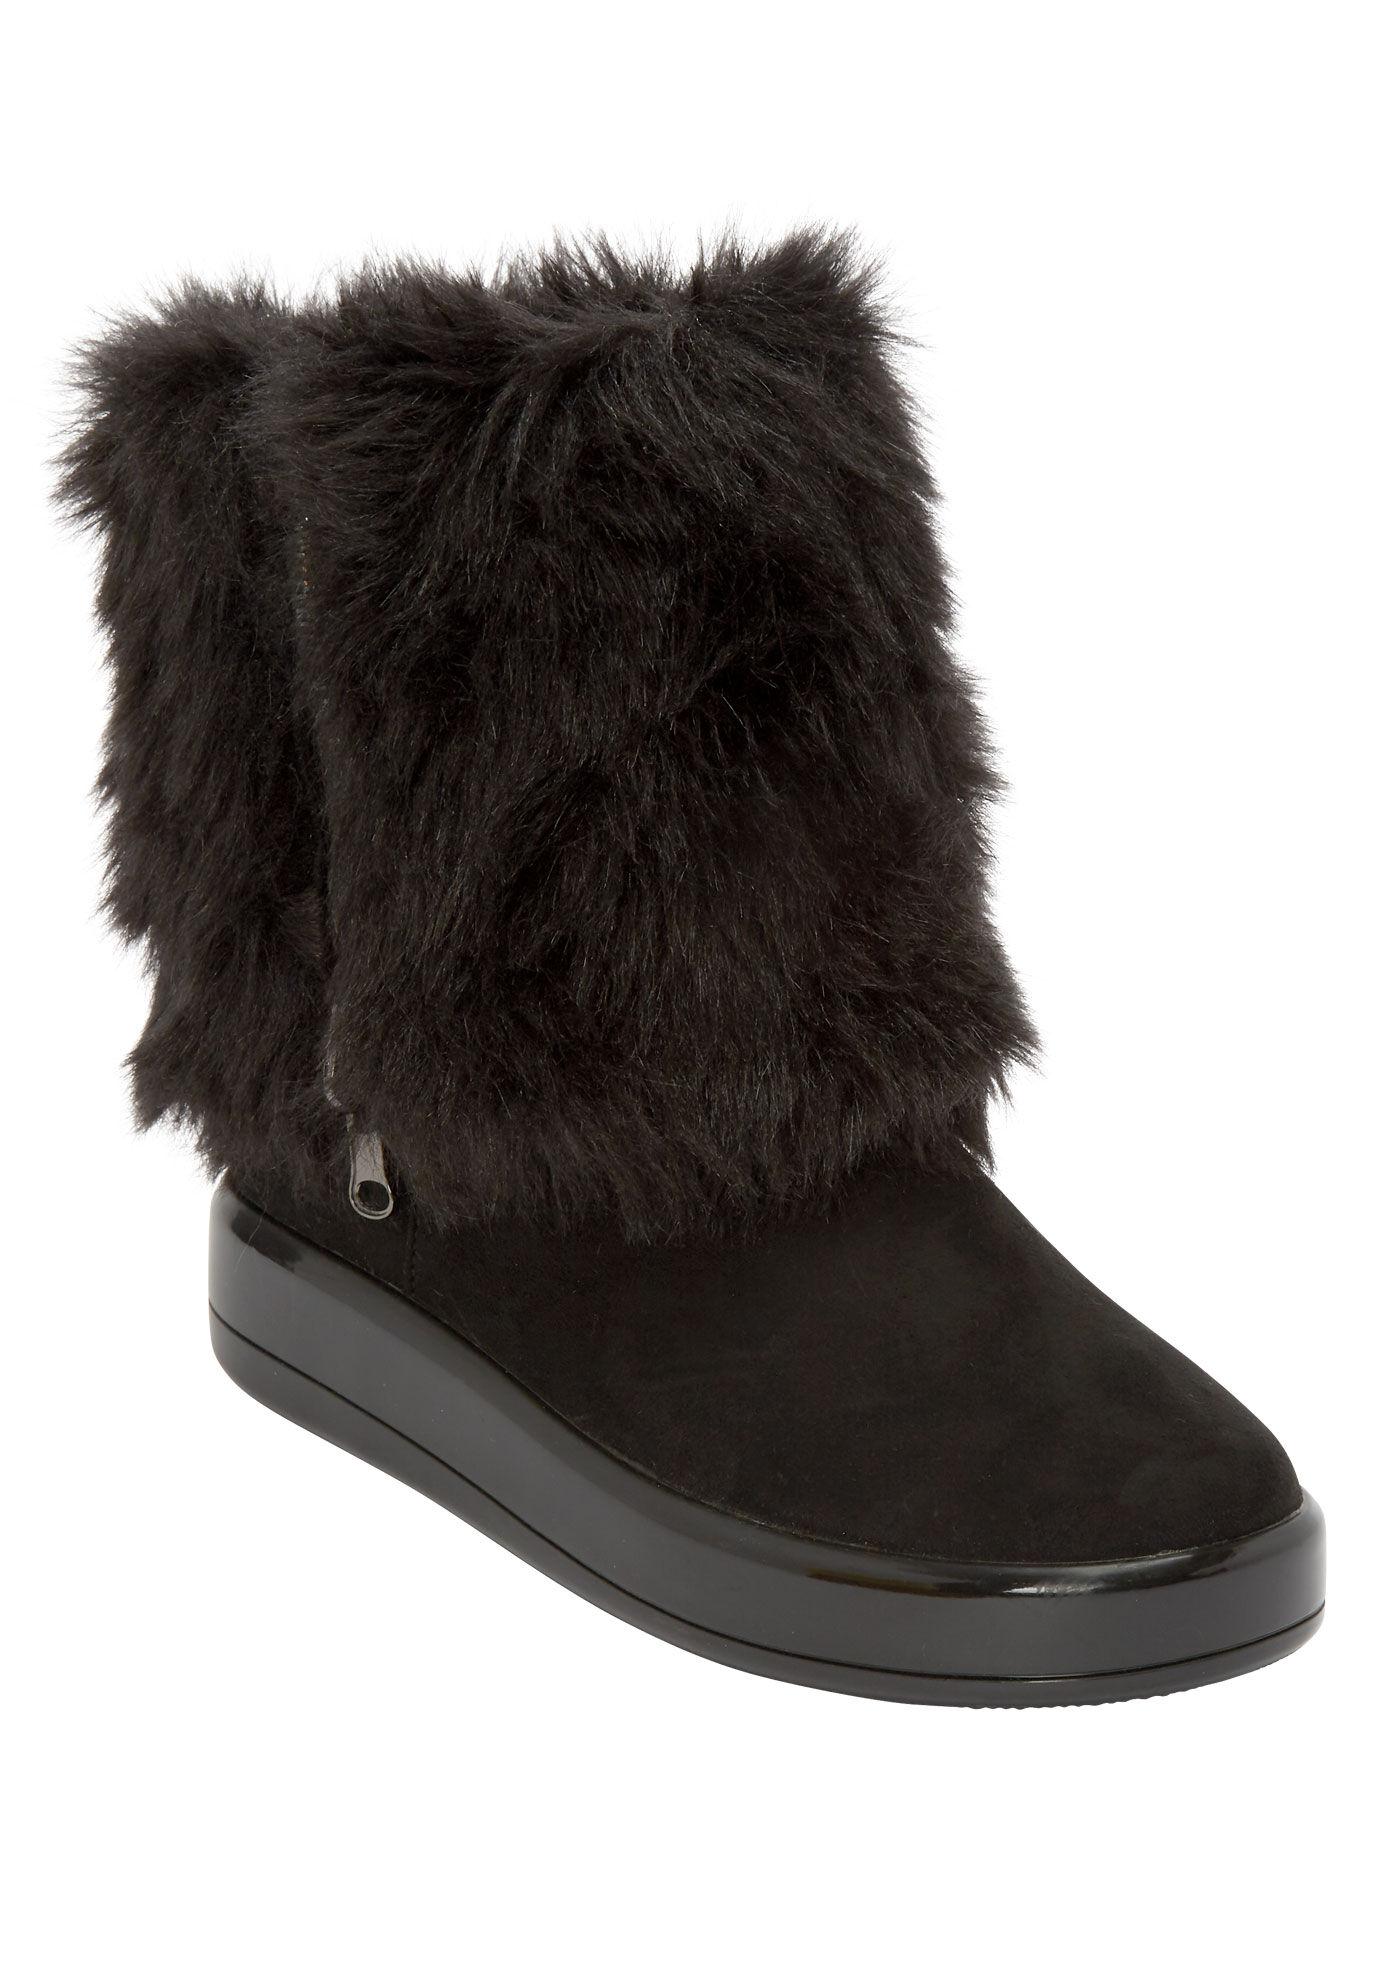 Wide Calf Warm Winter Boots for Women